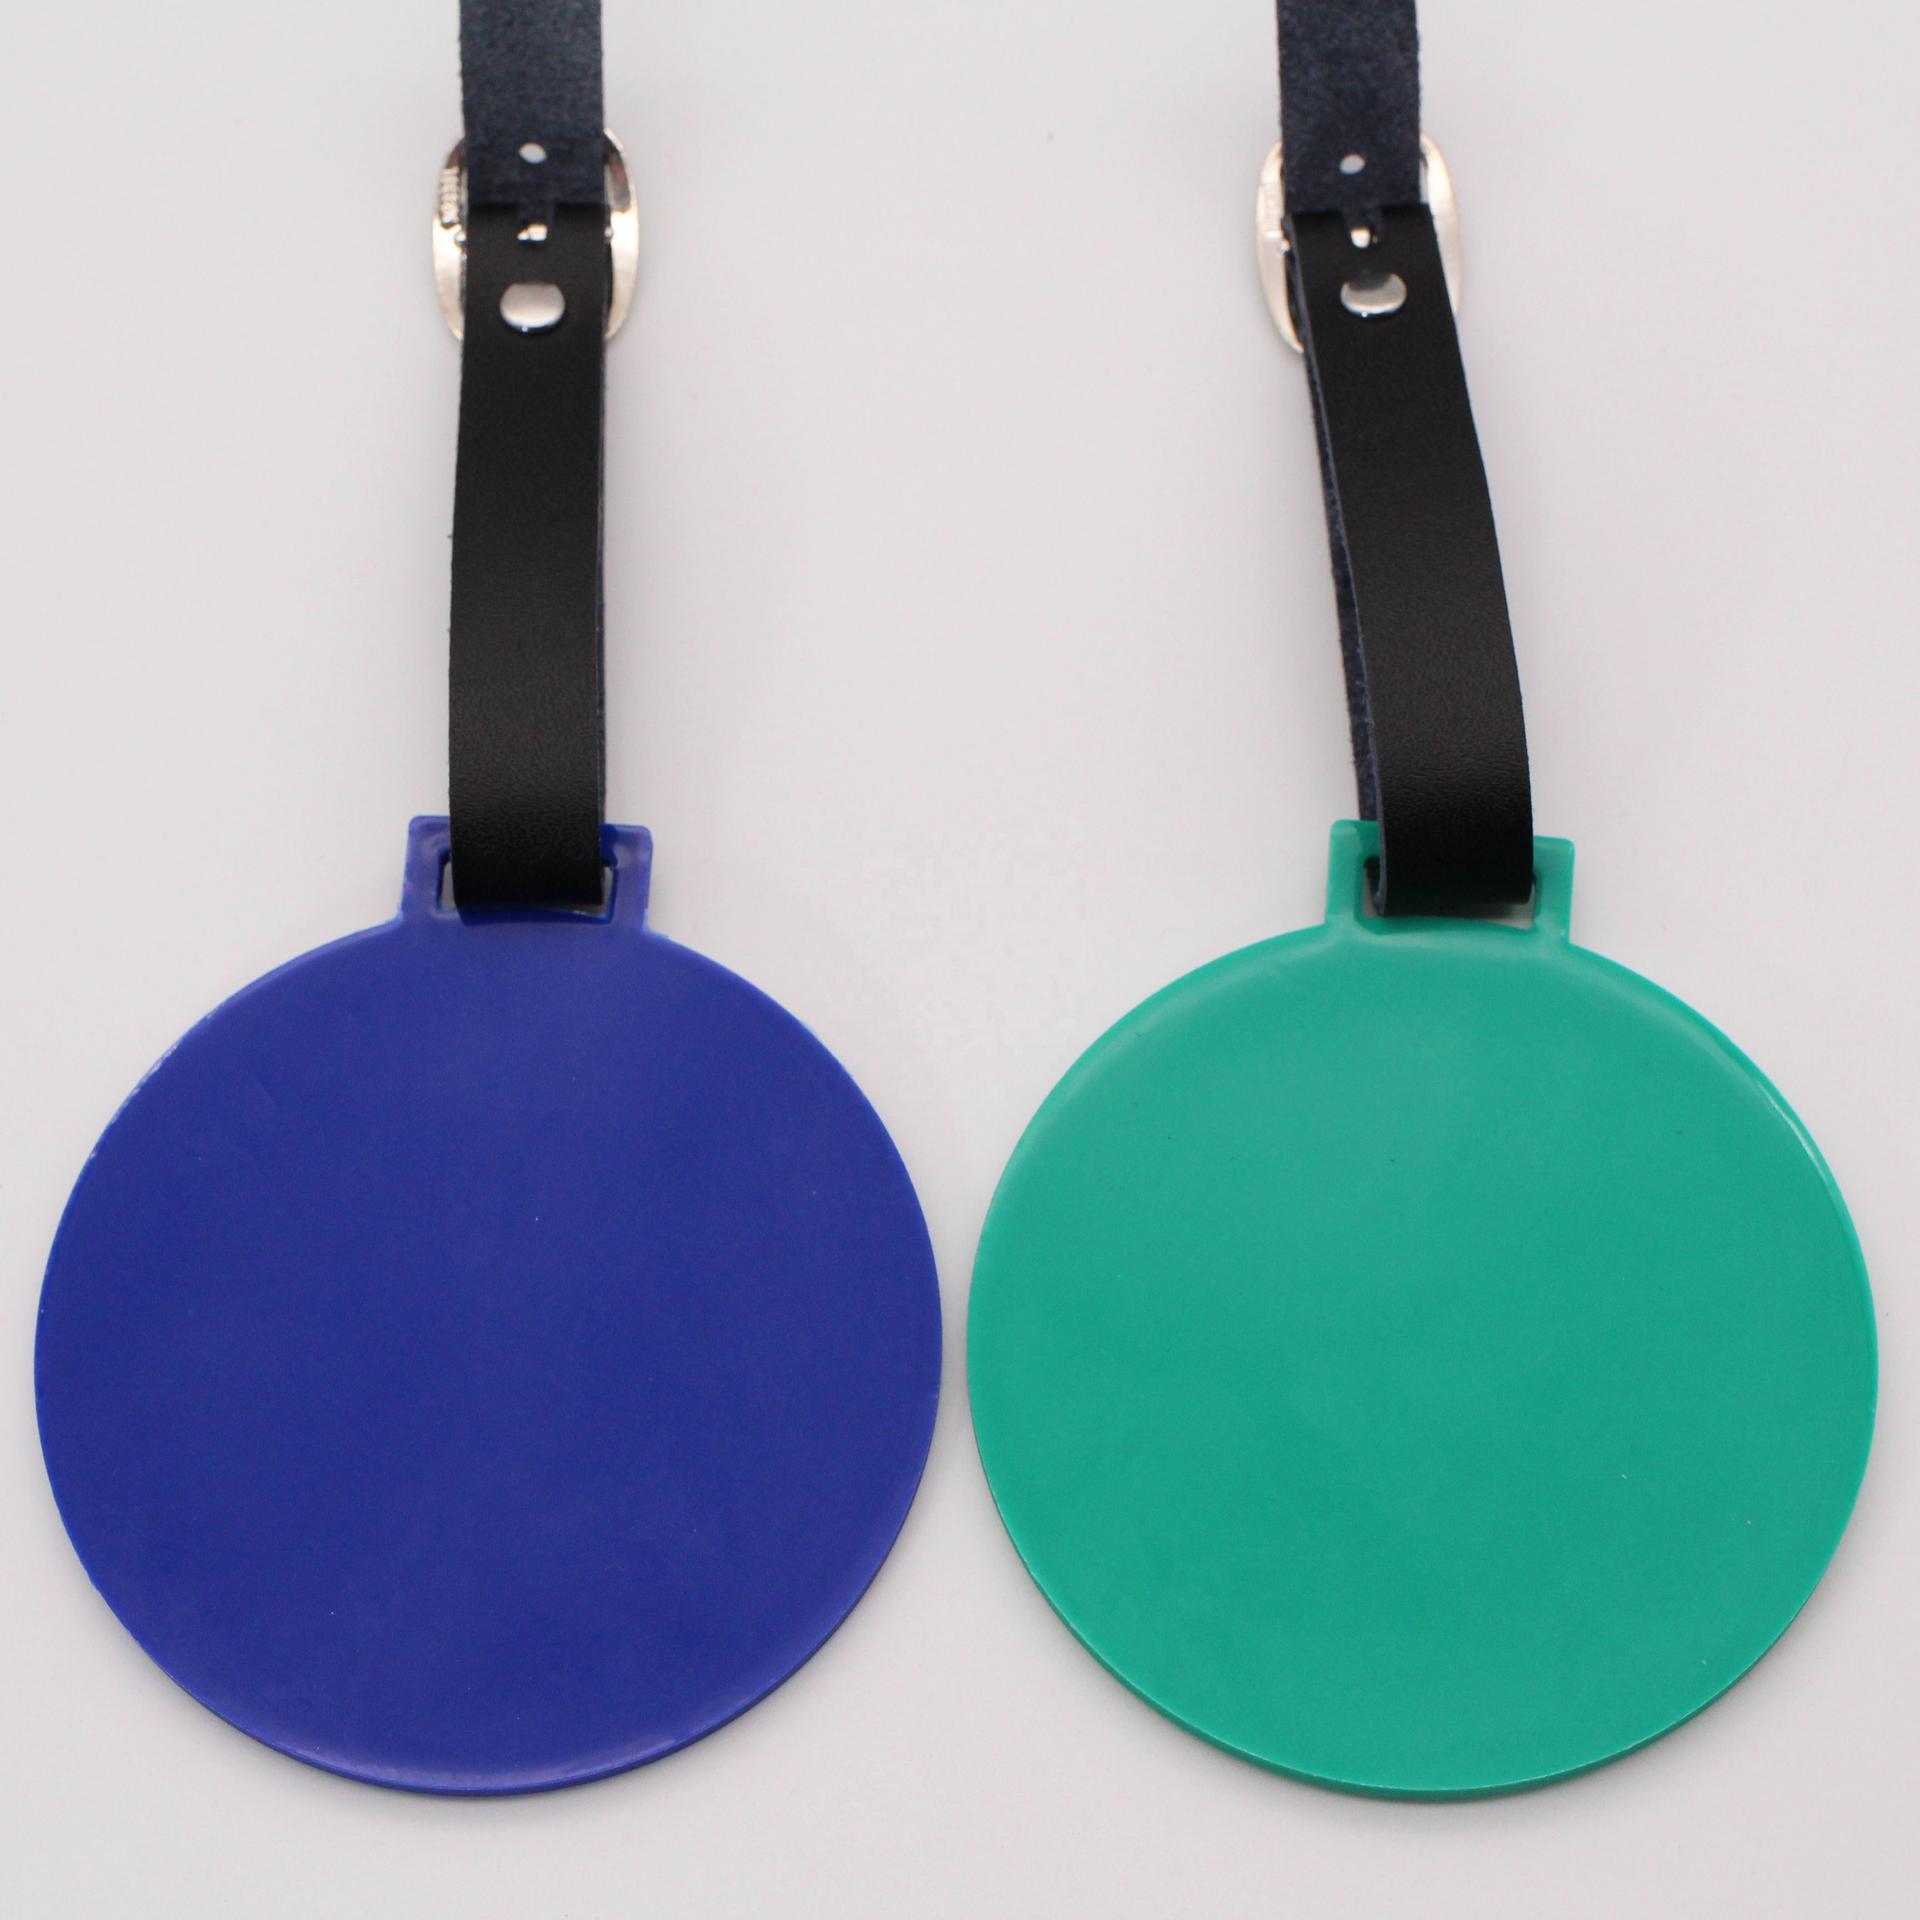 Cheap promotional custom round pvc golf bag tag